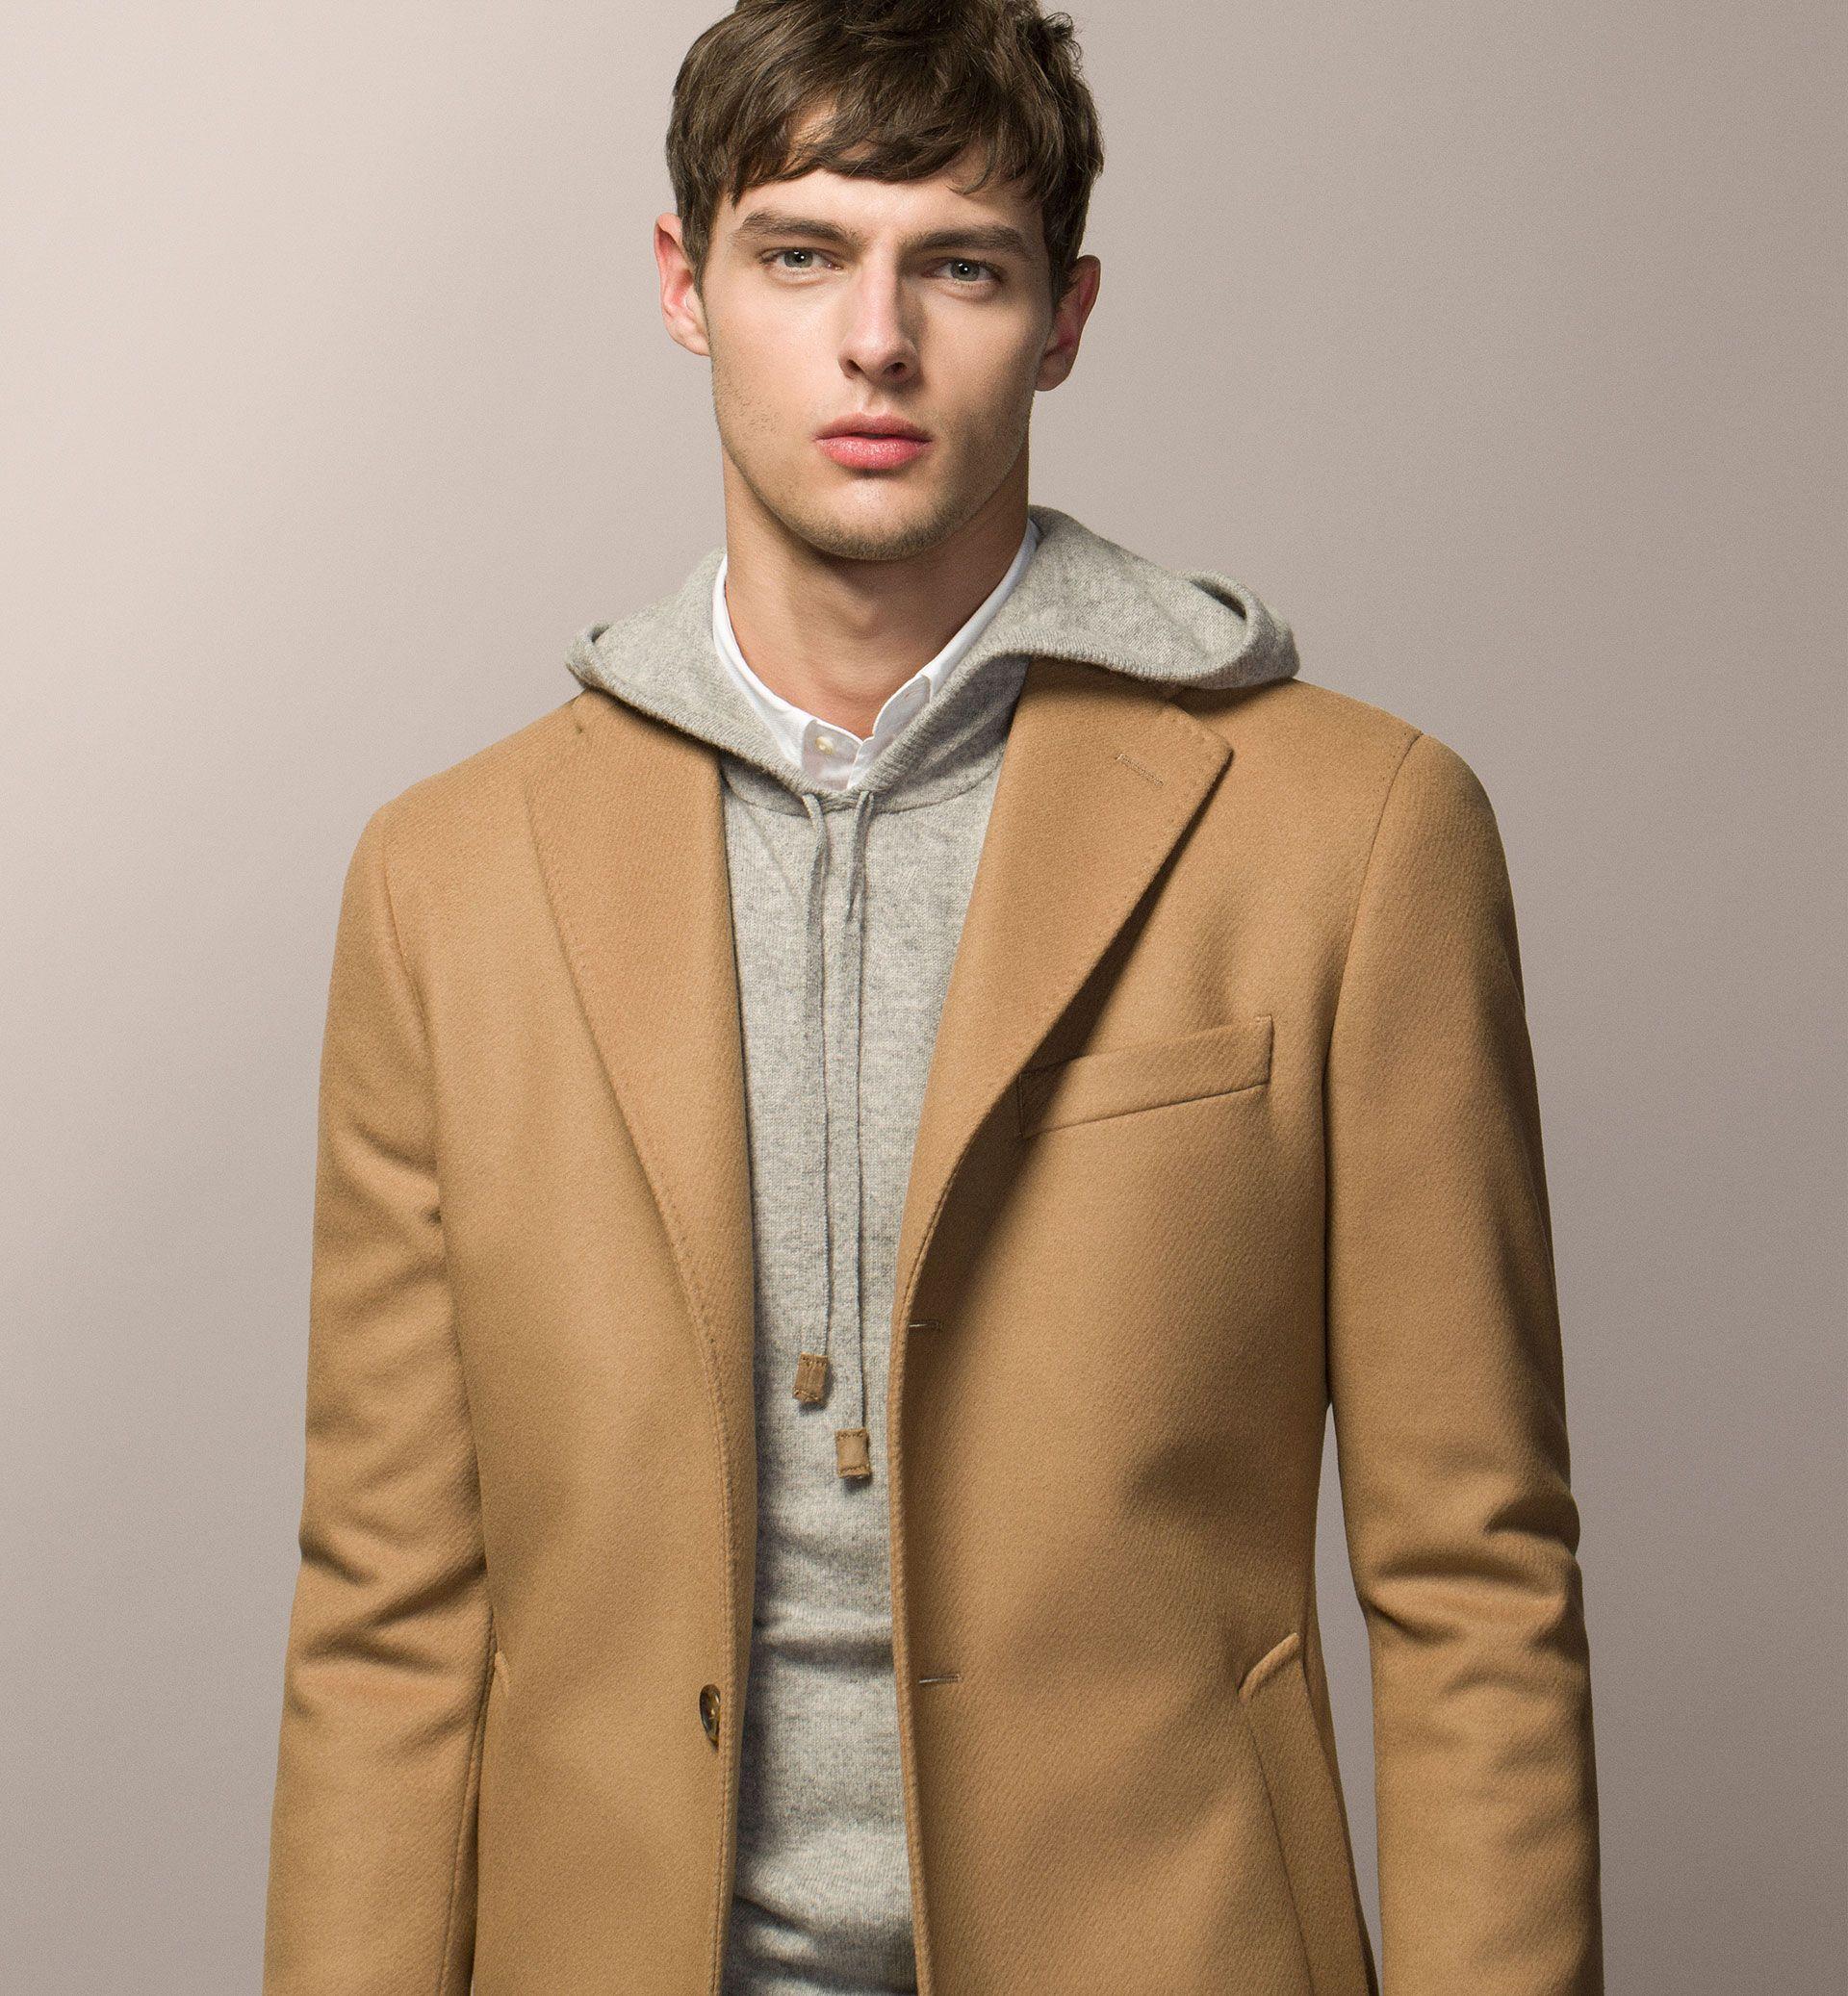 Mens jacket camel - Wool Cashmere Twill Coat